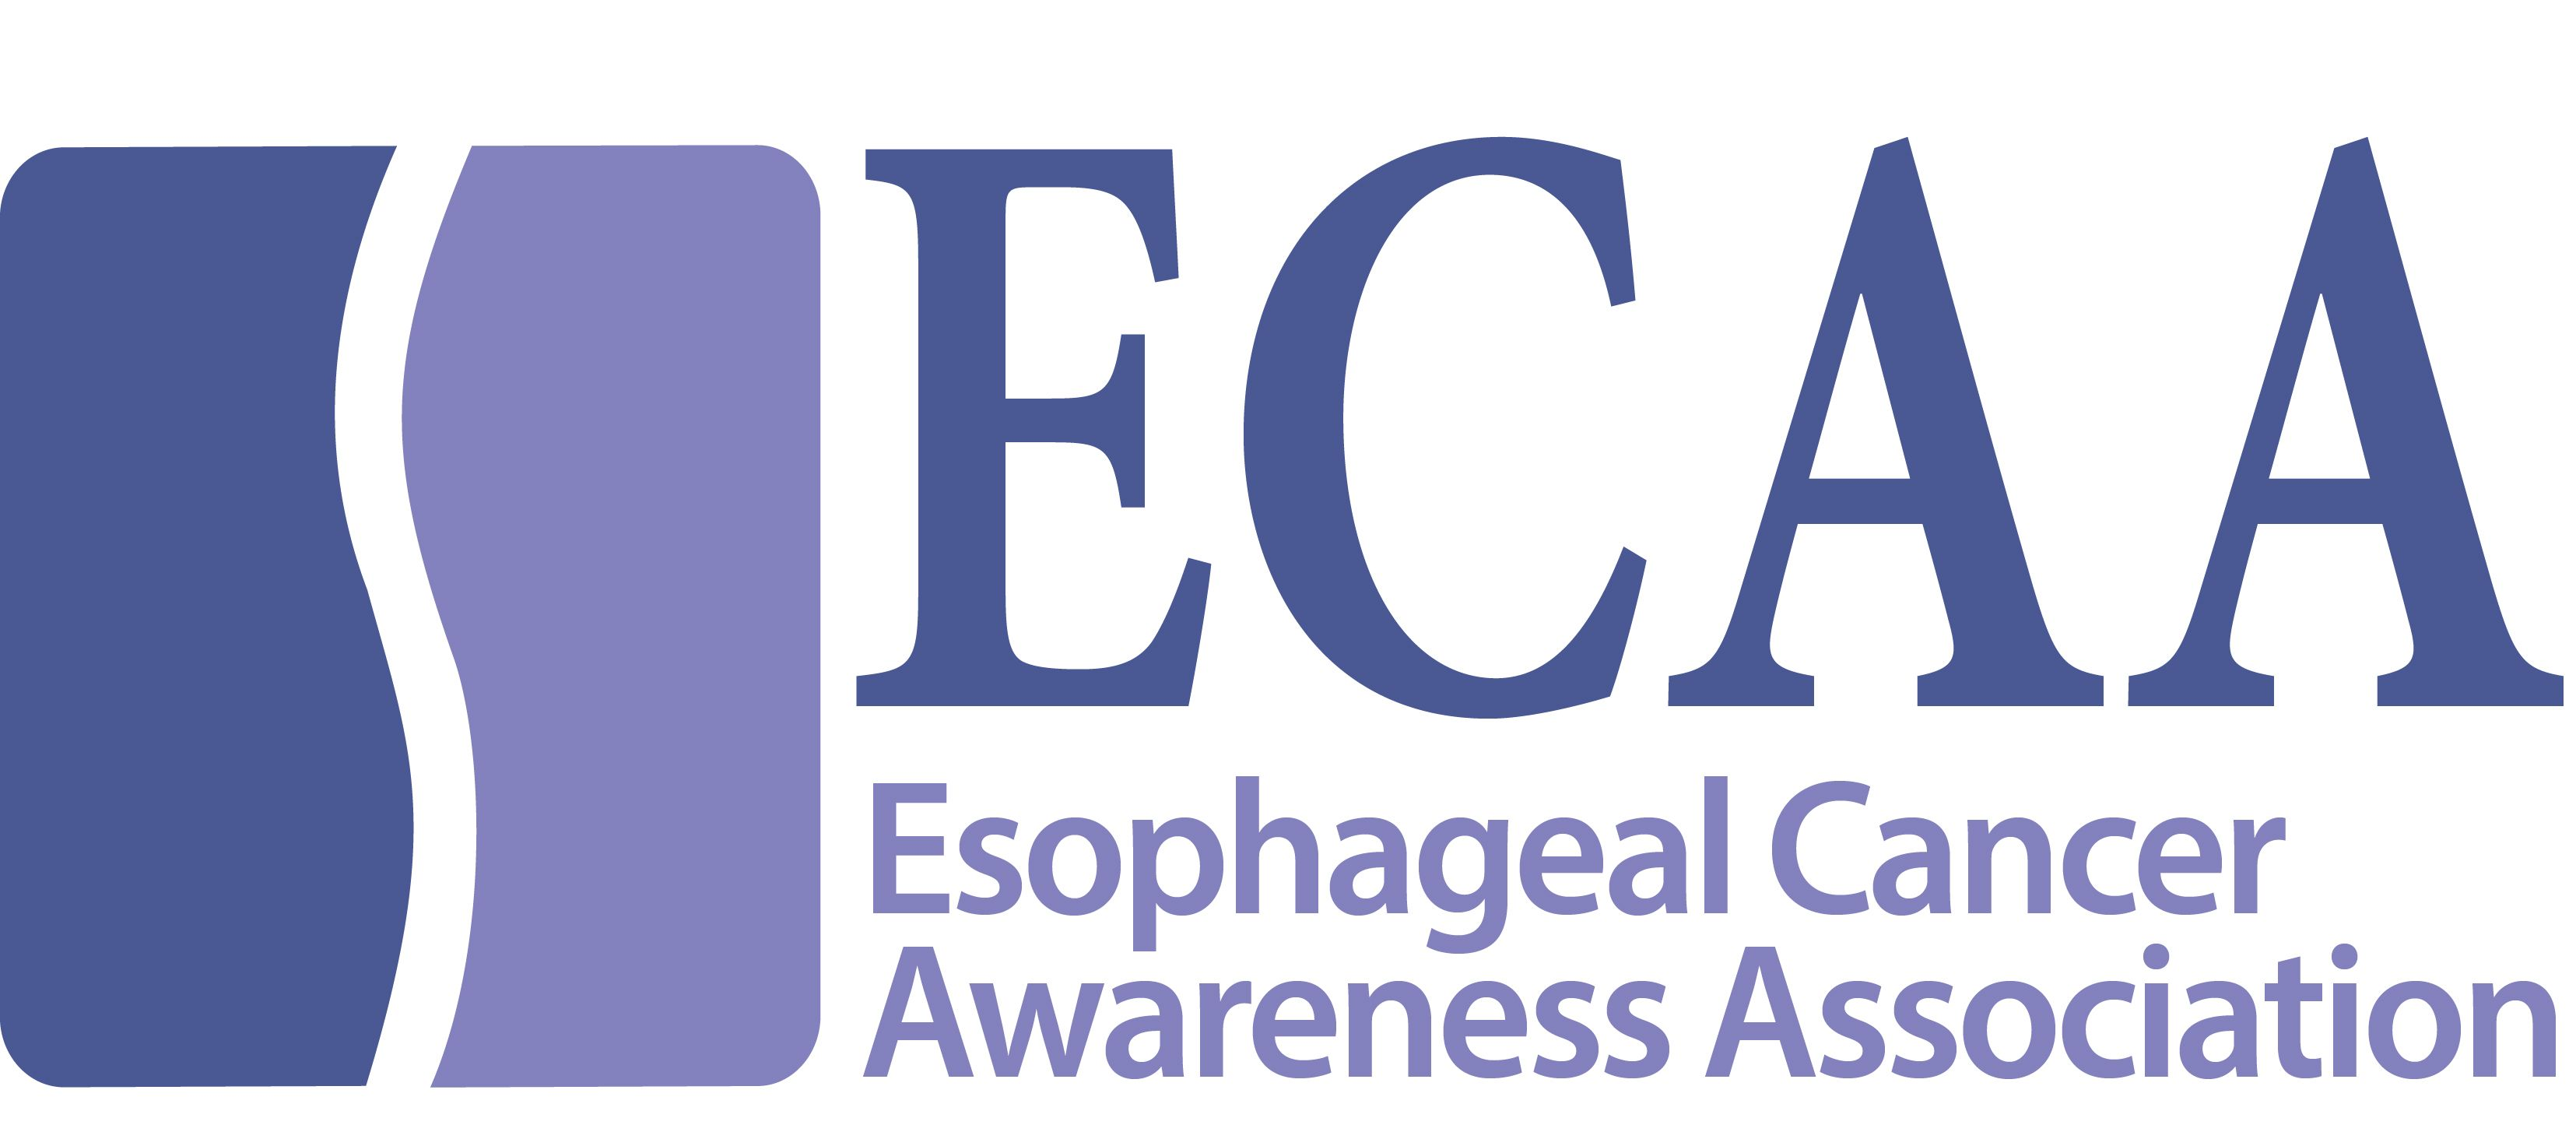 Sap Partners | Advocacy | <b>Esophageal Cancer Awareness Association</b>